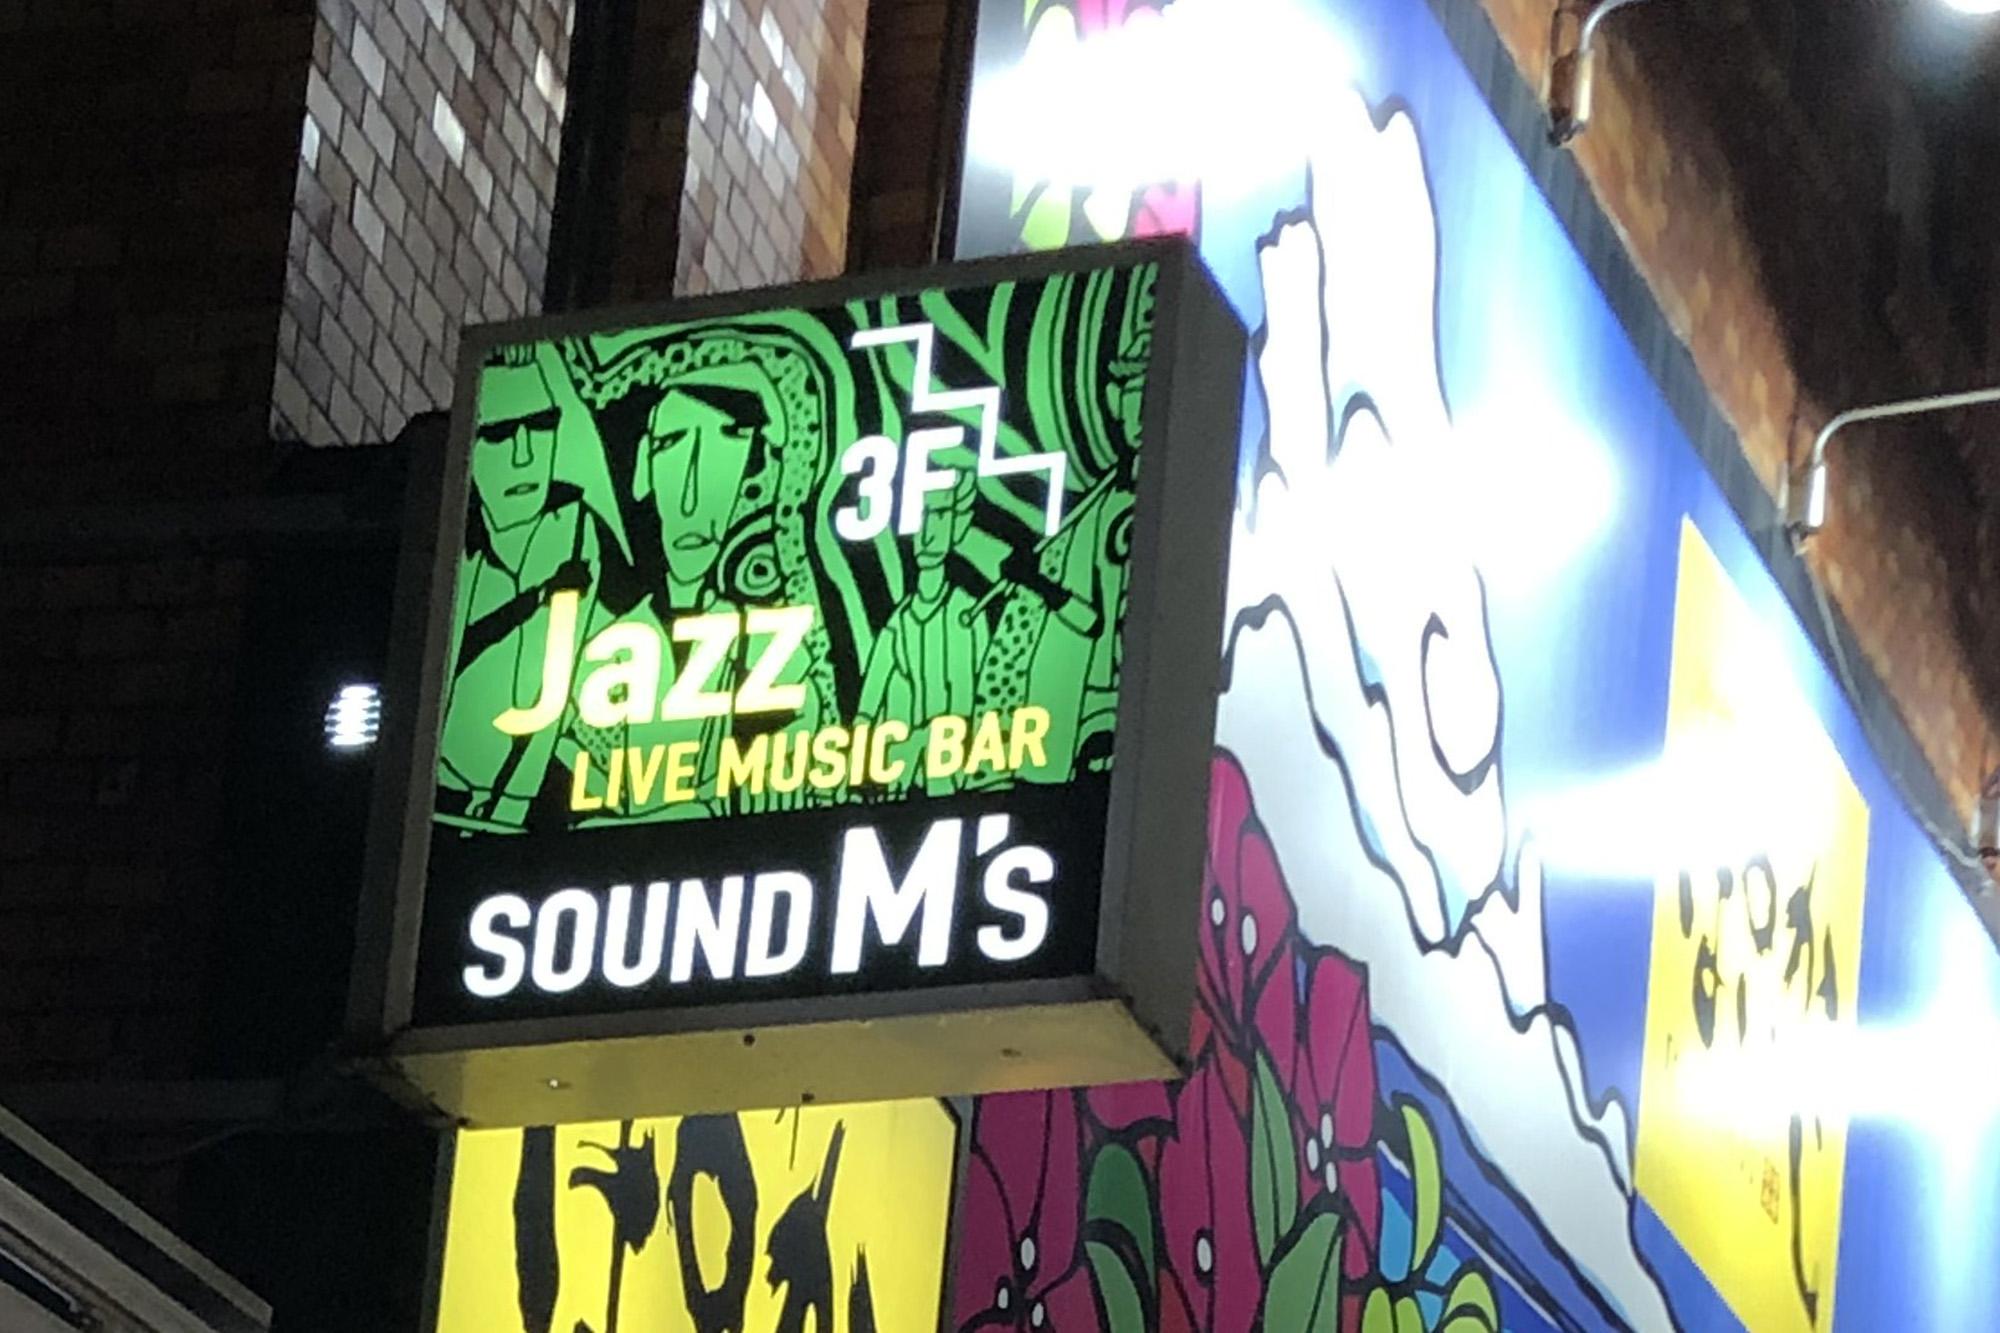 AZZやブルースが気軽に聴ける 「Live Music Bar SOUND M'S(サウンドエムズ)」| 那覇市久茂地 国際通り / CELEBRATIONS maki | Beauty Studio